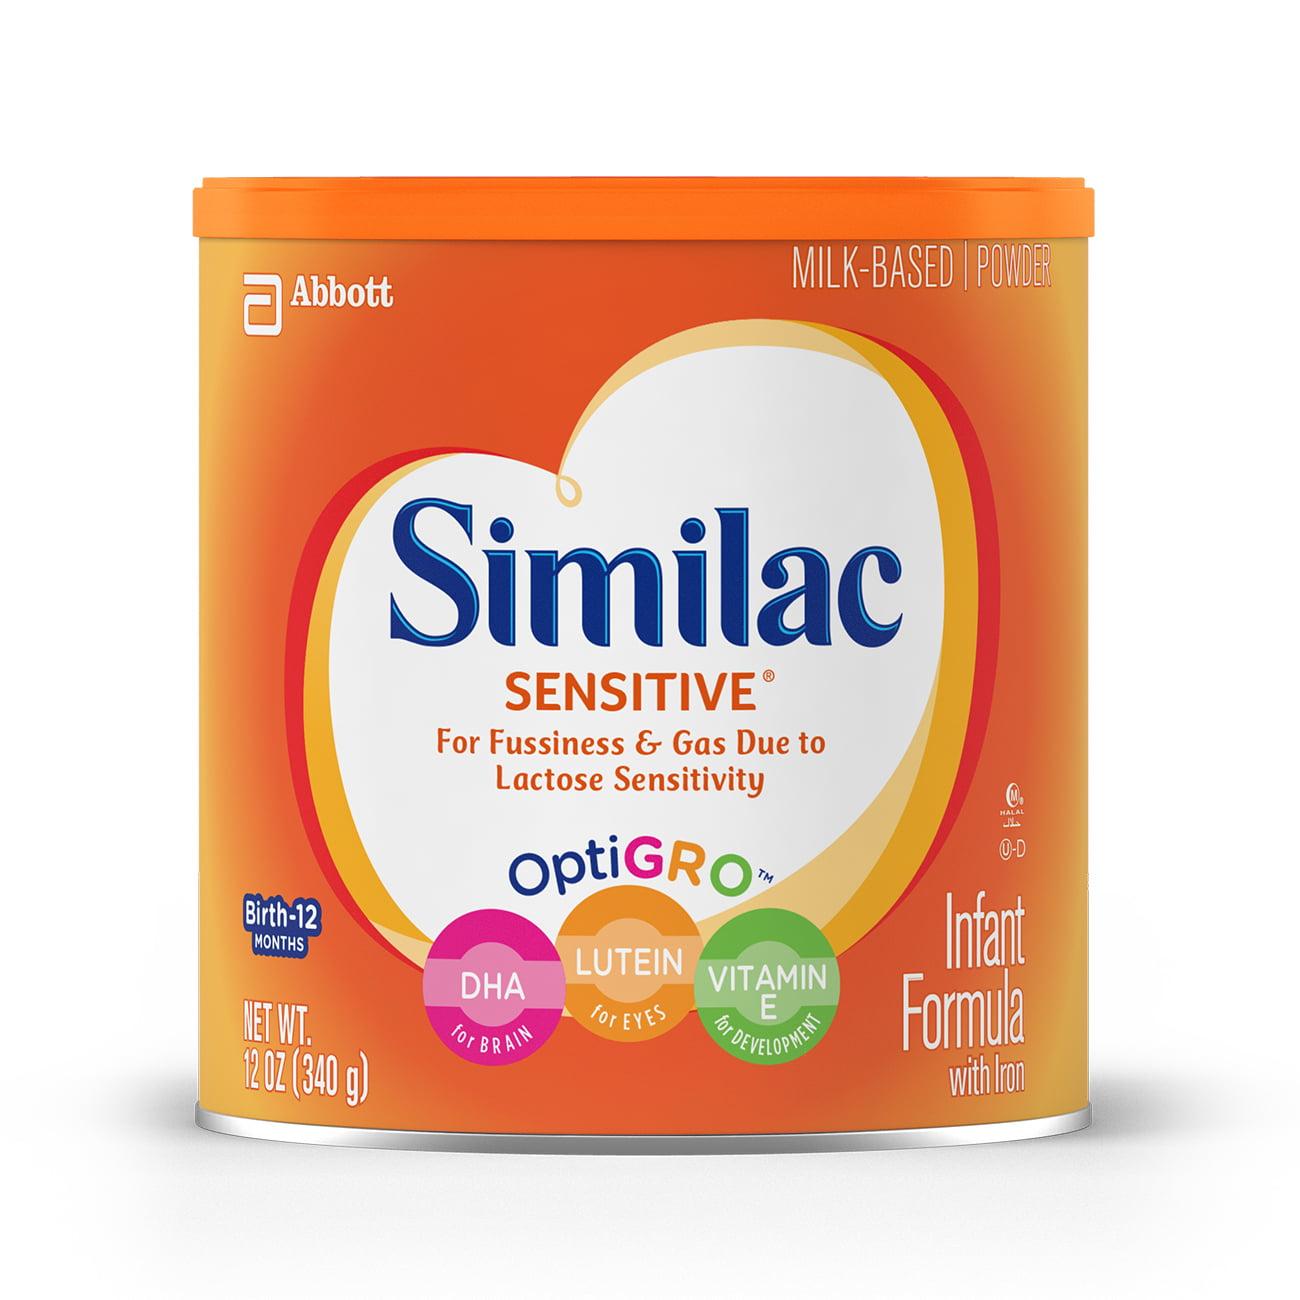 Similac Sensitive Infant Formula with Iron (6 Pack) Powder, 12 oz